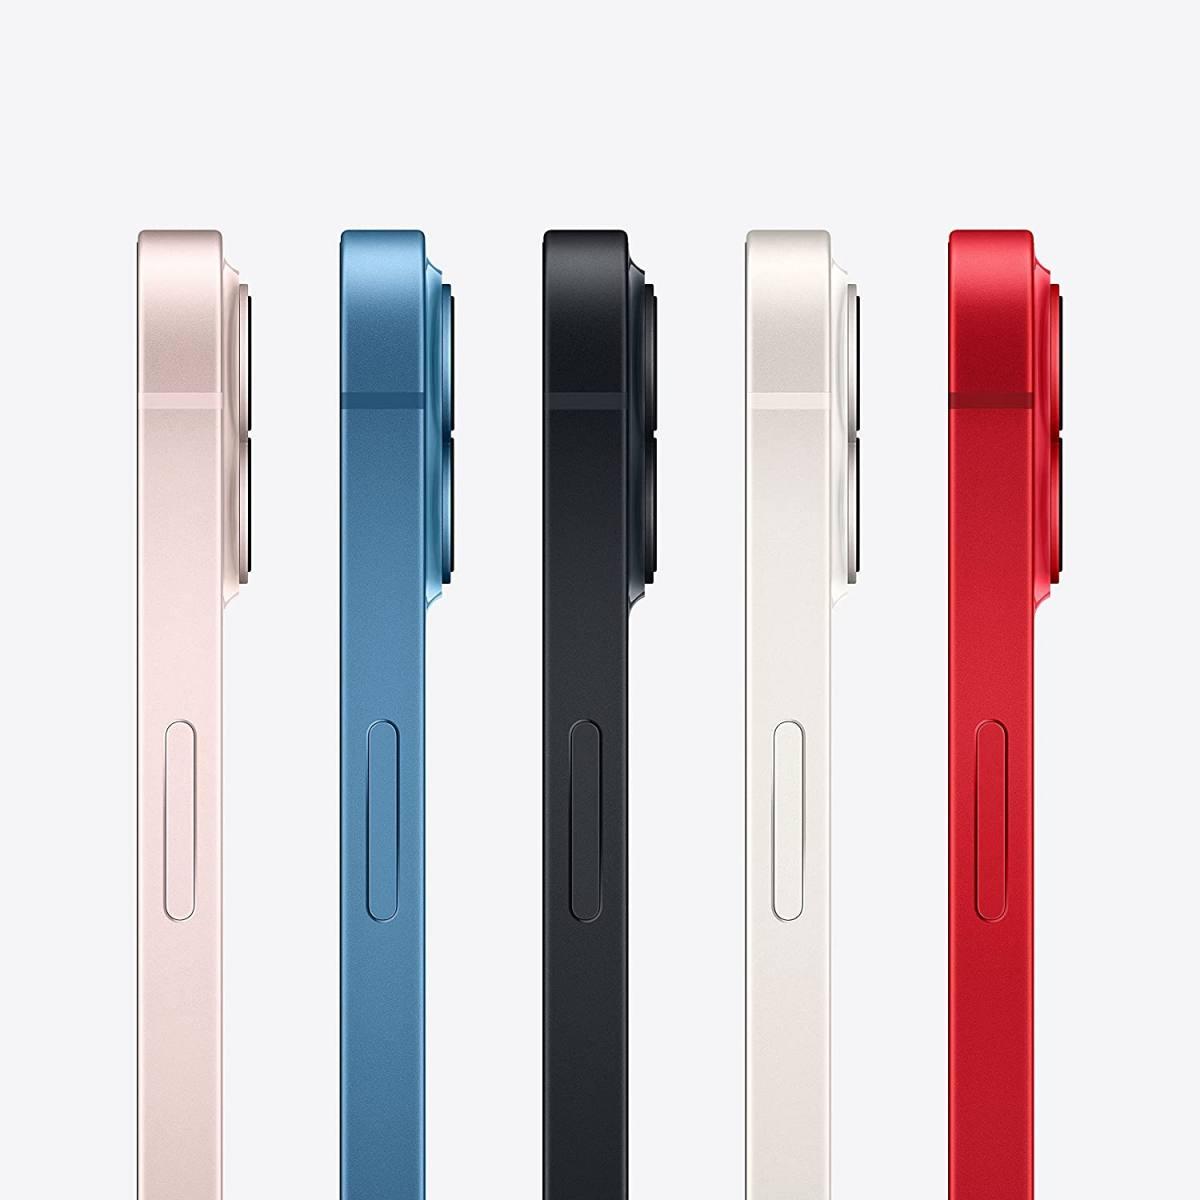 apple iPhone 13 scaled SuperChollos